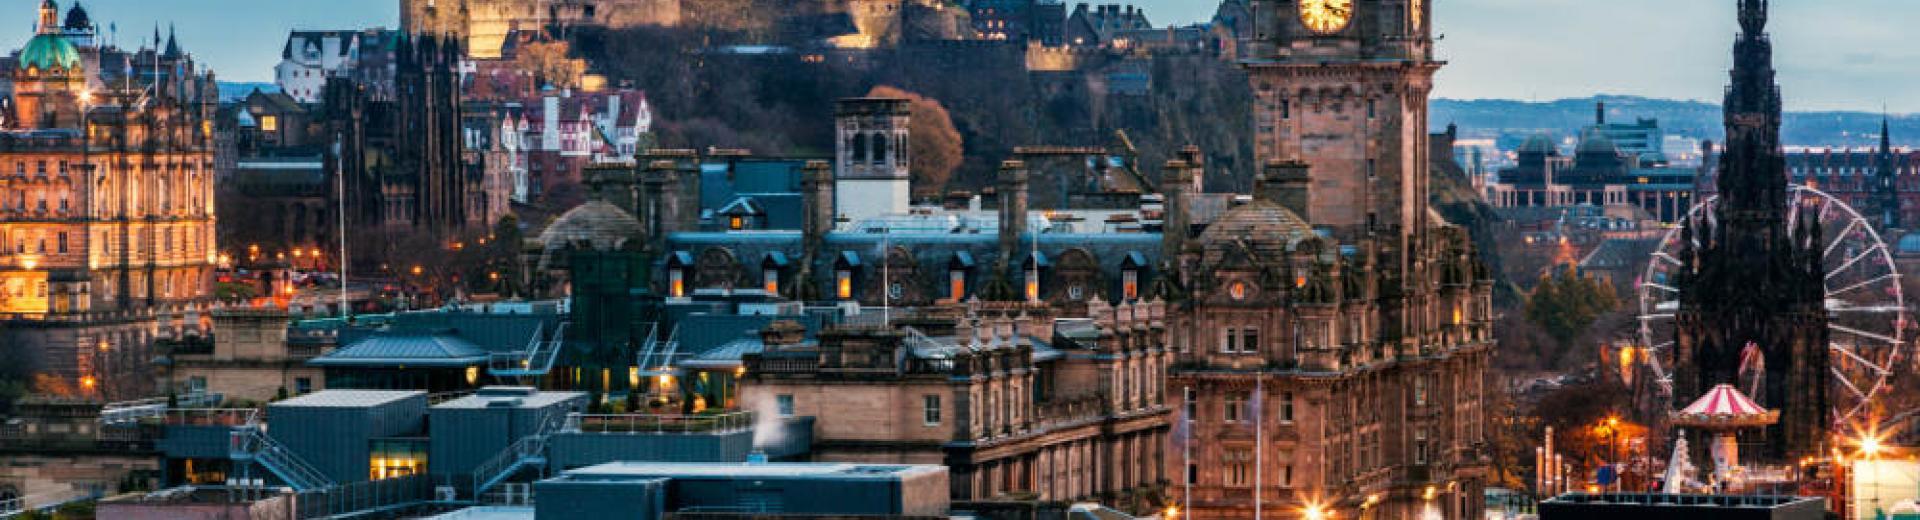 Scot edinburgh